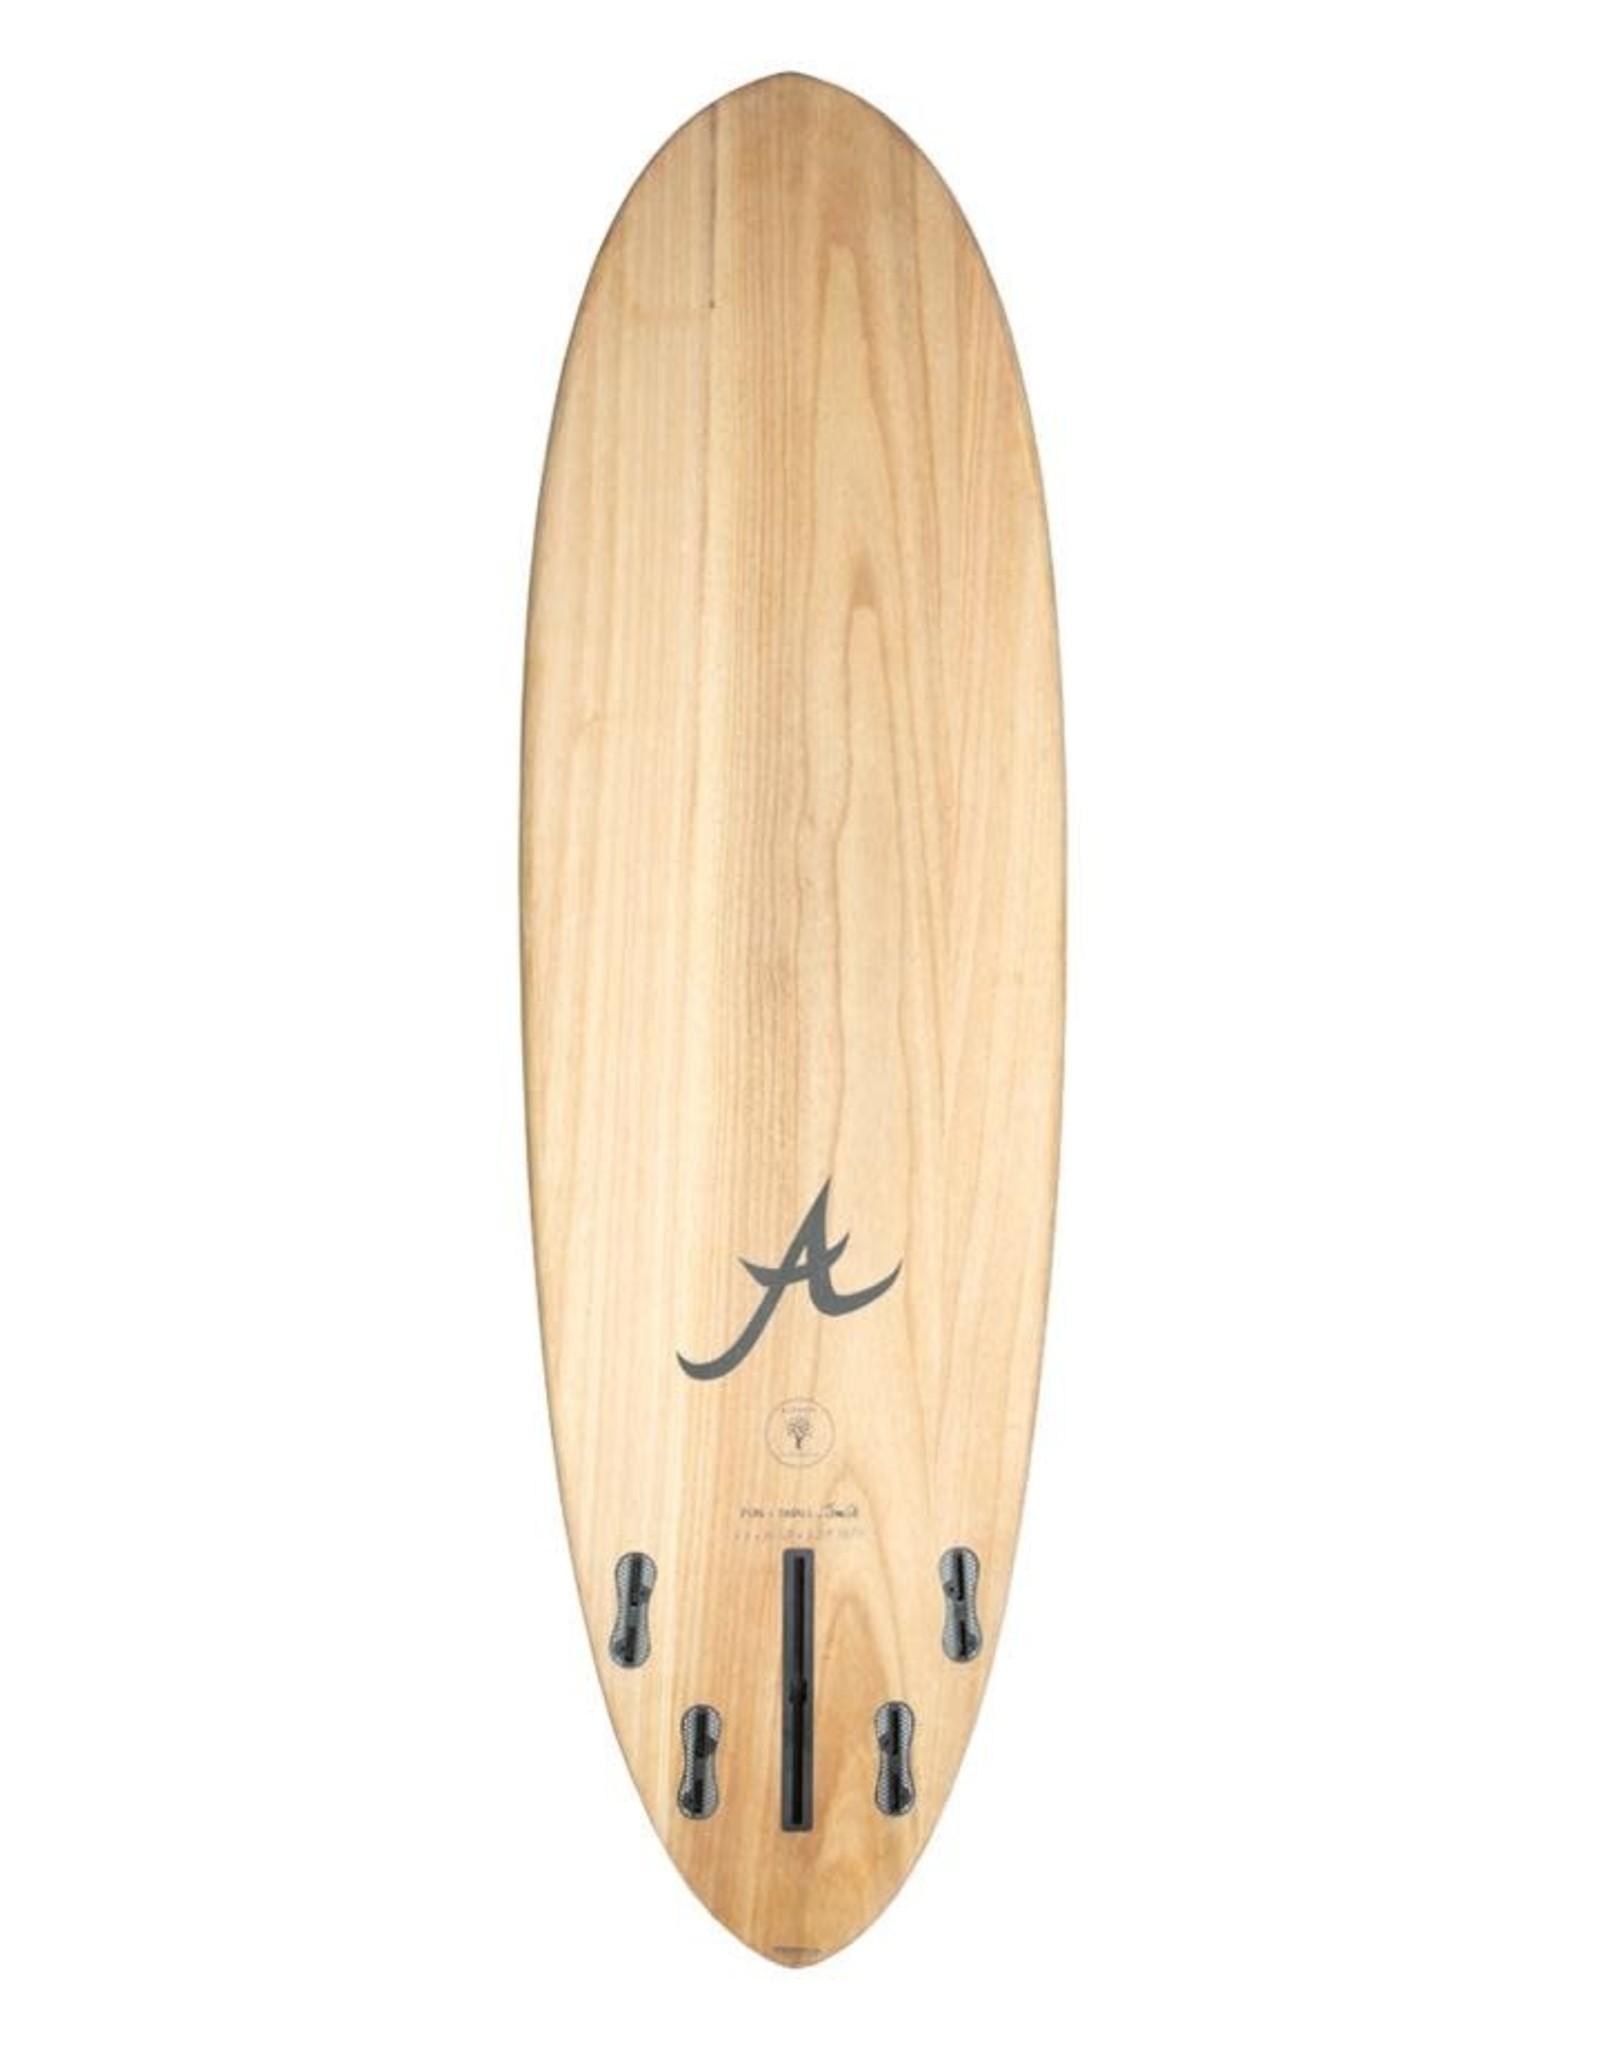 "Aloha Aloha 6'4"" Eco Skin Wood Fun Division"